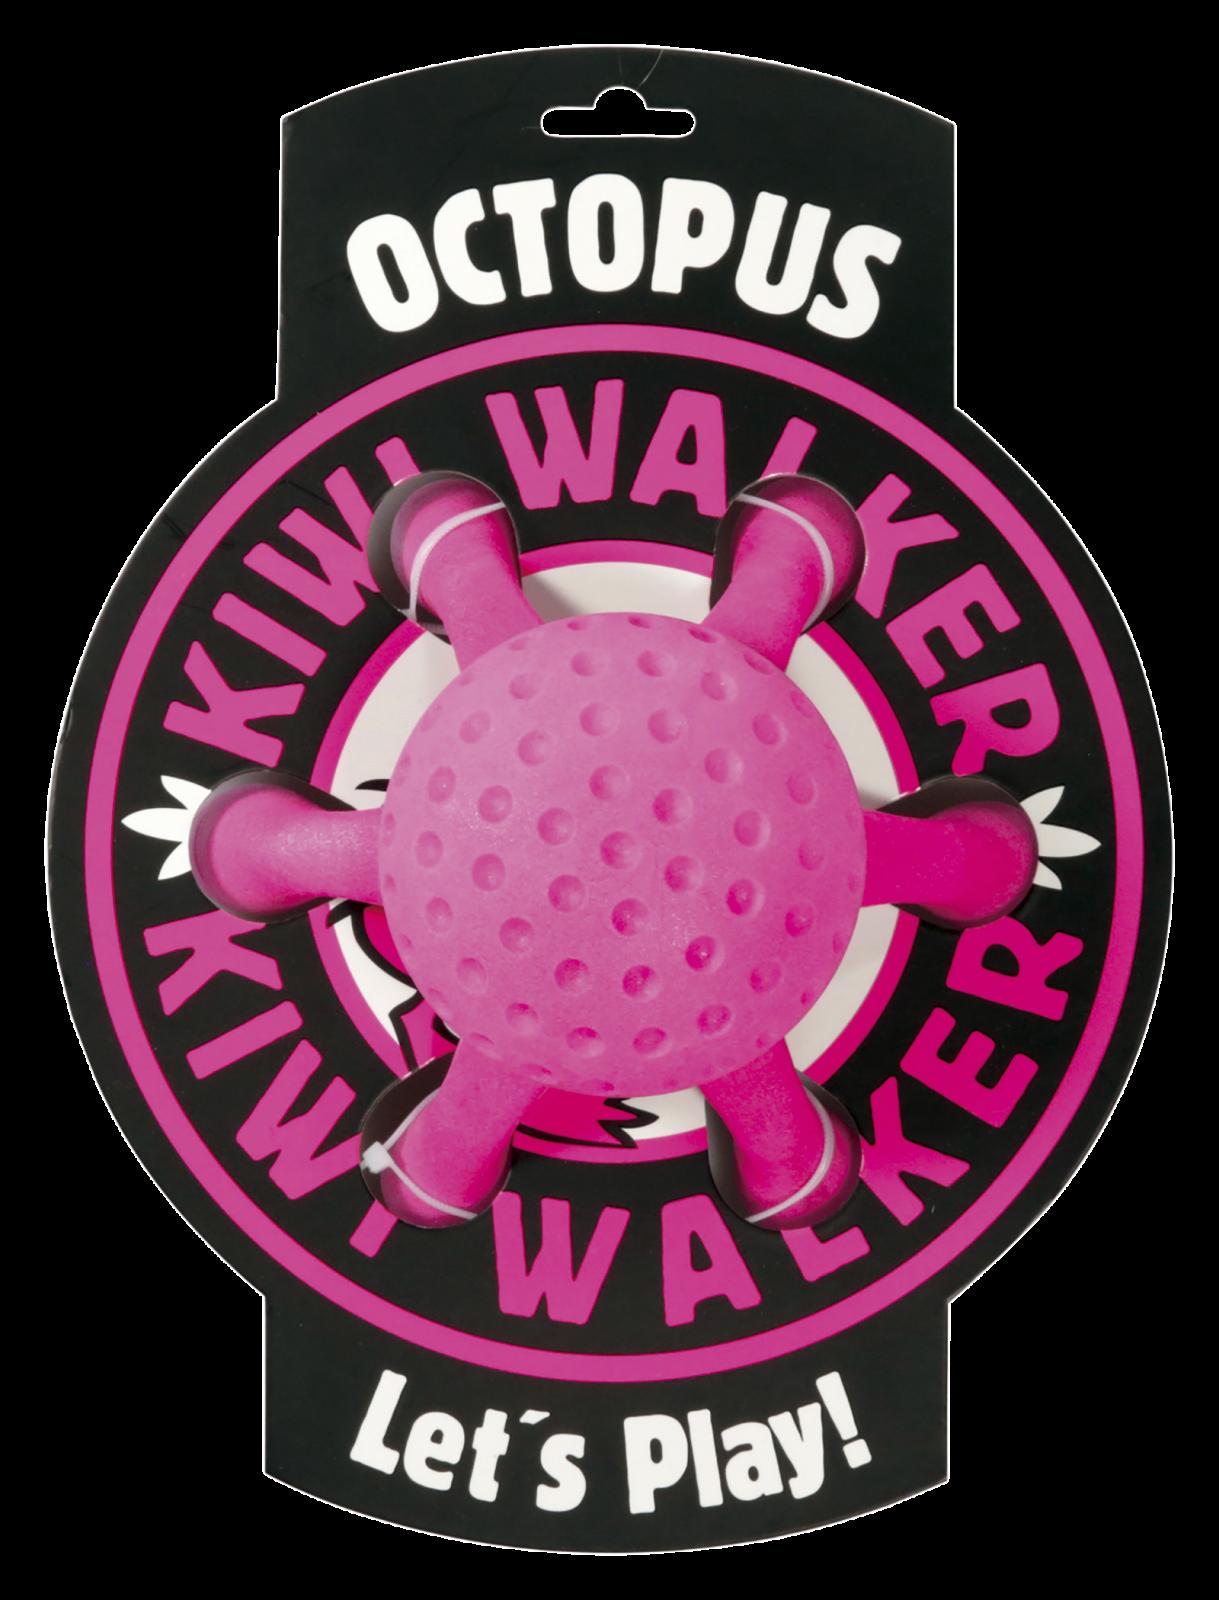 KiwiWalker Let's play! OCTOPUS MAXI pink (20cm)